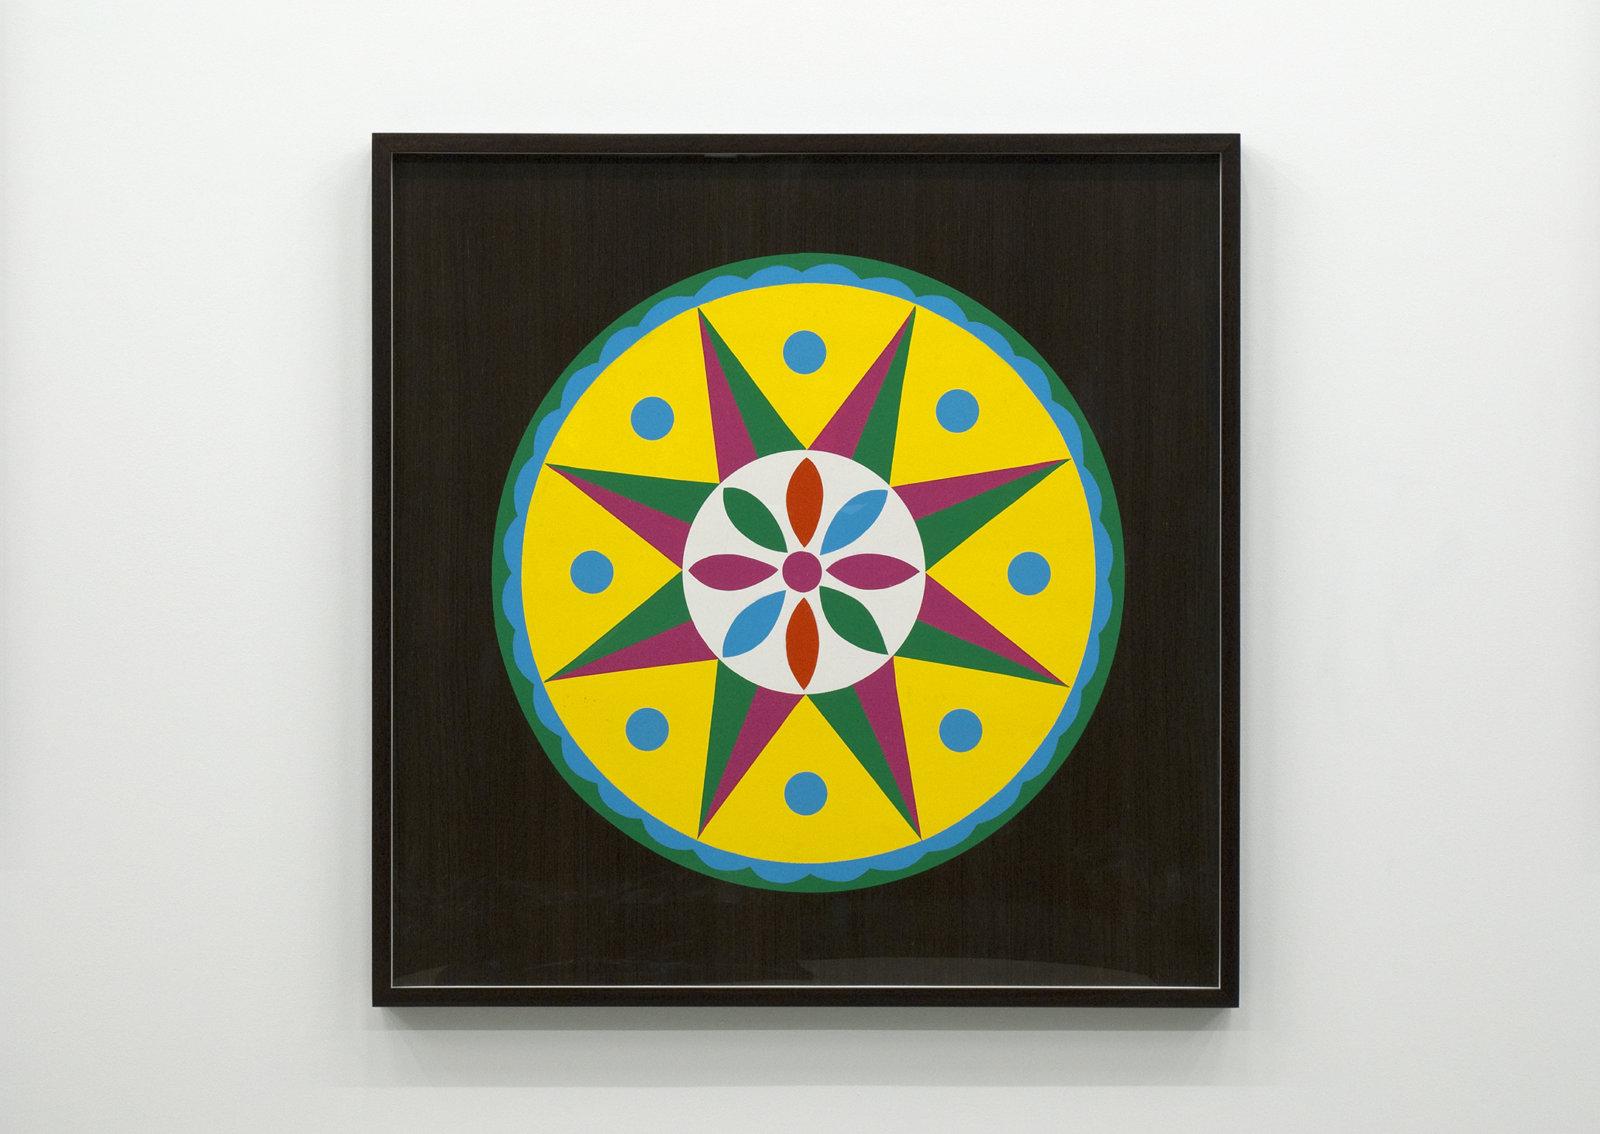 Myfanwy MacLeod, Hex III, 2009, enamel on wood, 48 x 48 in. (122 x 122 cm) by Myfanwy MacLeod